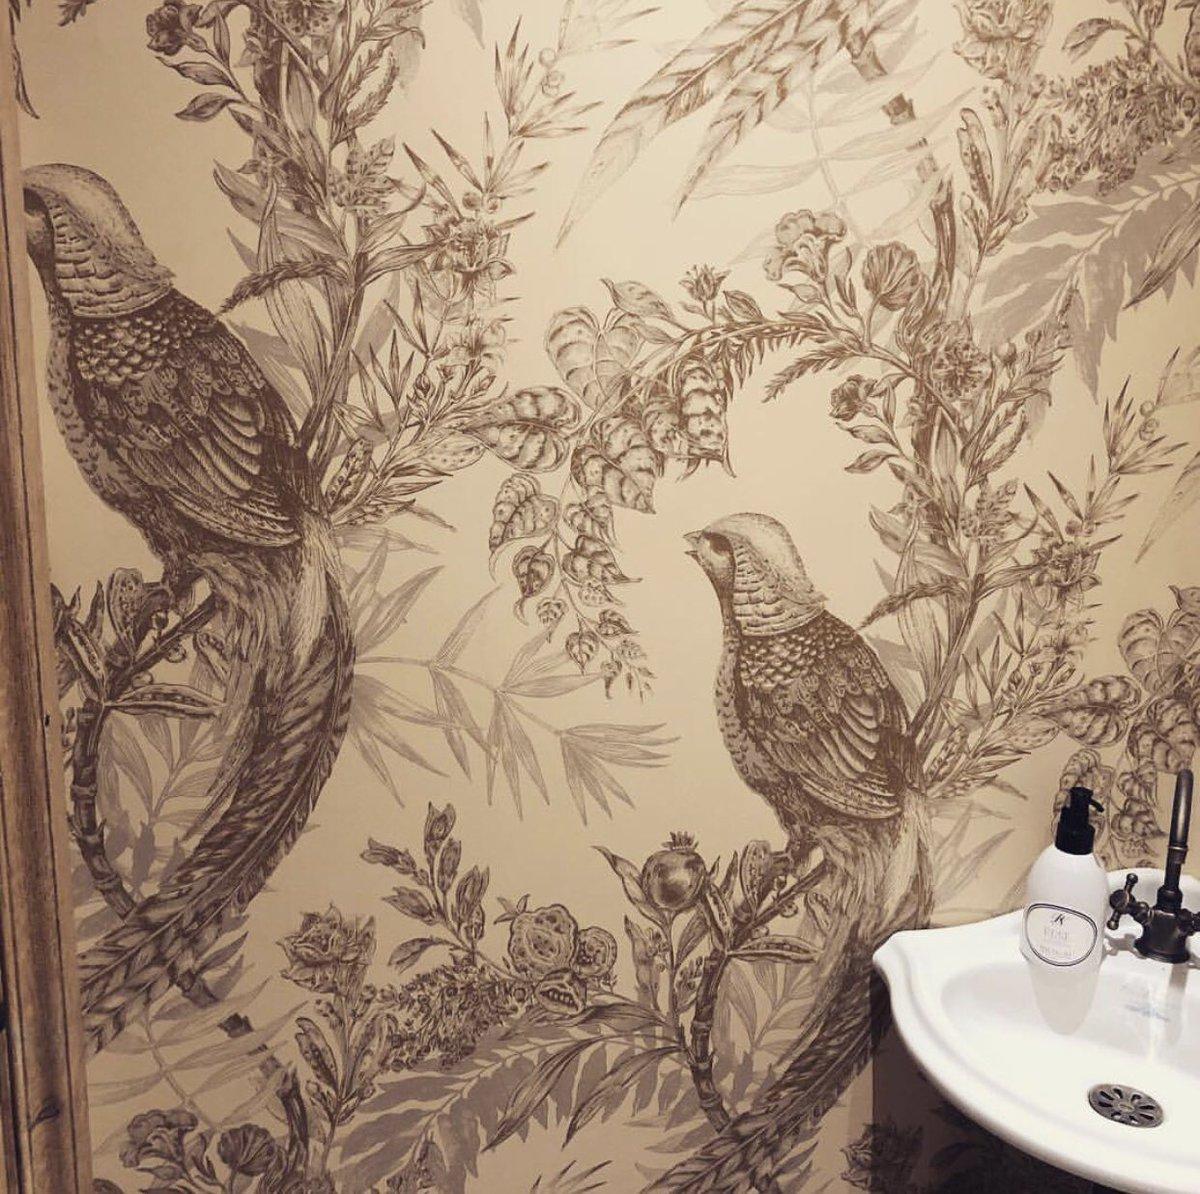 #wallpaper #tapete #design #print #pheasants #birds #Vögel #interiors #inneneinrichtung #interiordesign #raumgestaltung #interiordesigners #raumgestalter ...